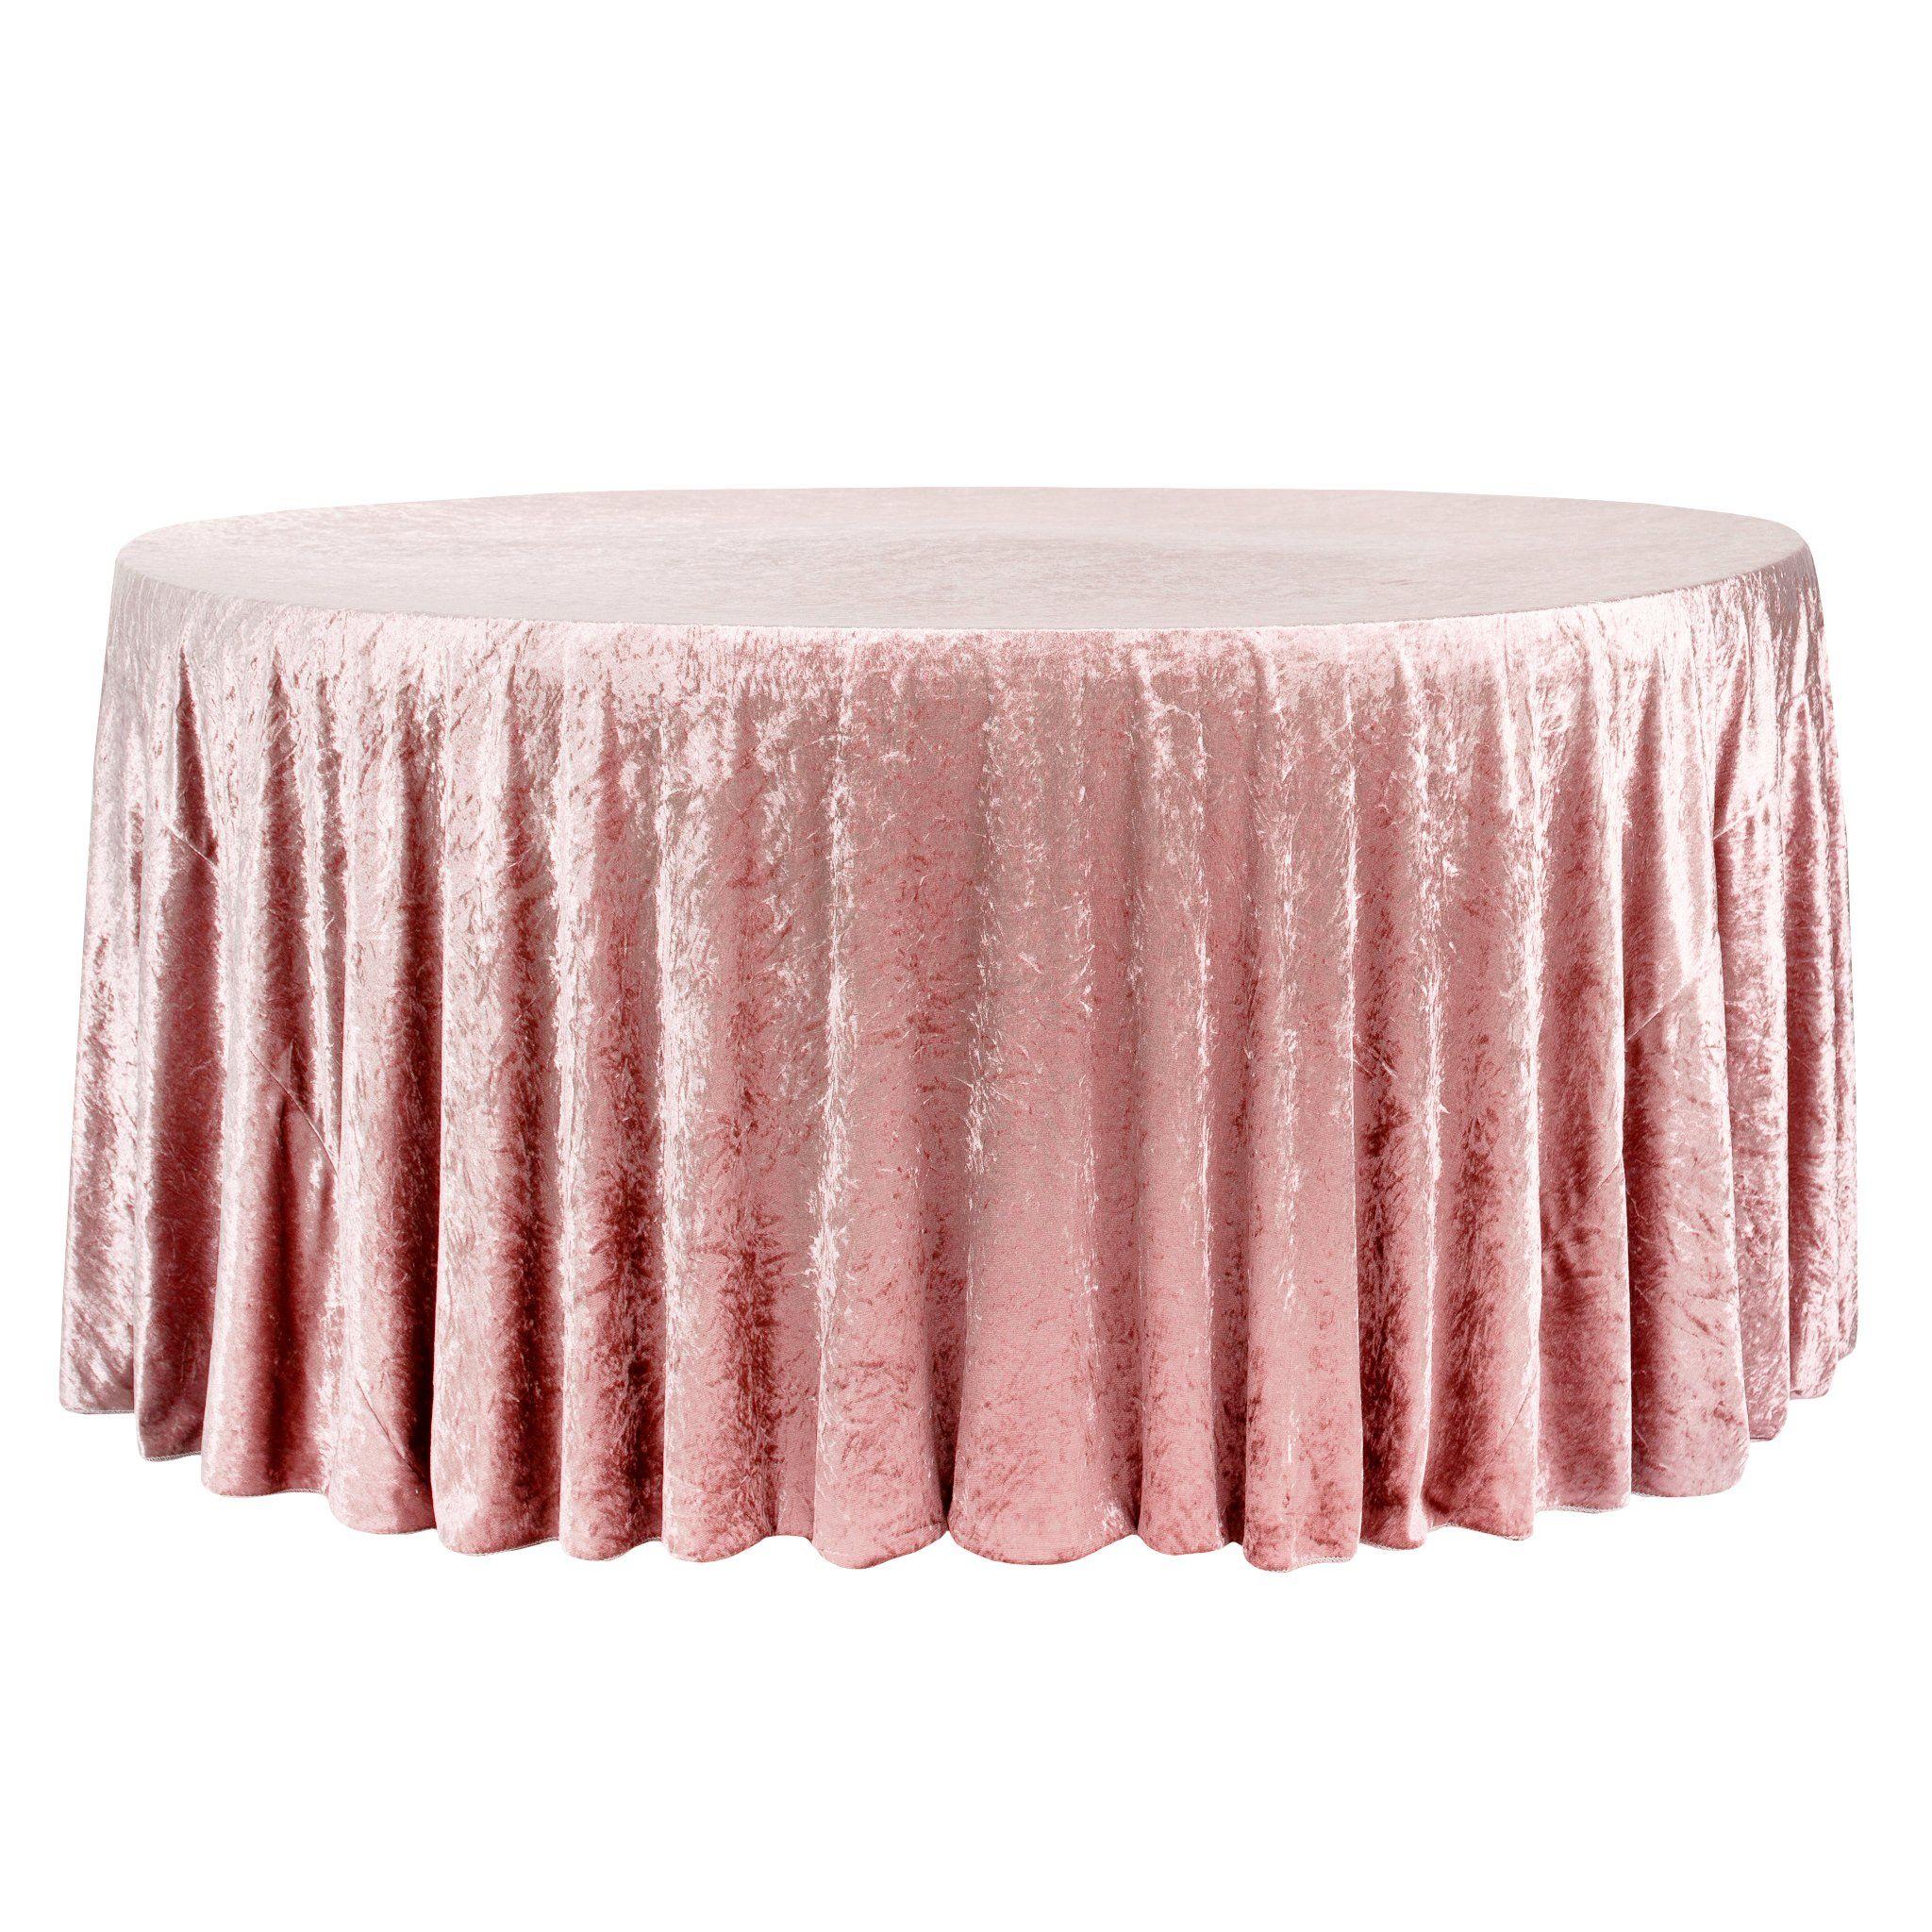 Velvet 132 Round Tablecloth Dusty Rose Mauve Cv Linens In 2020